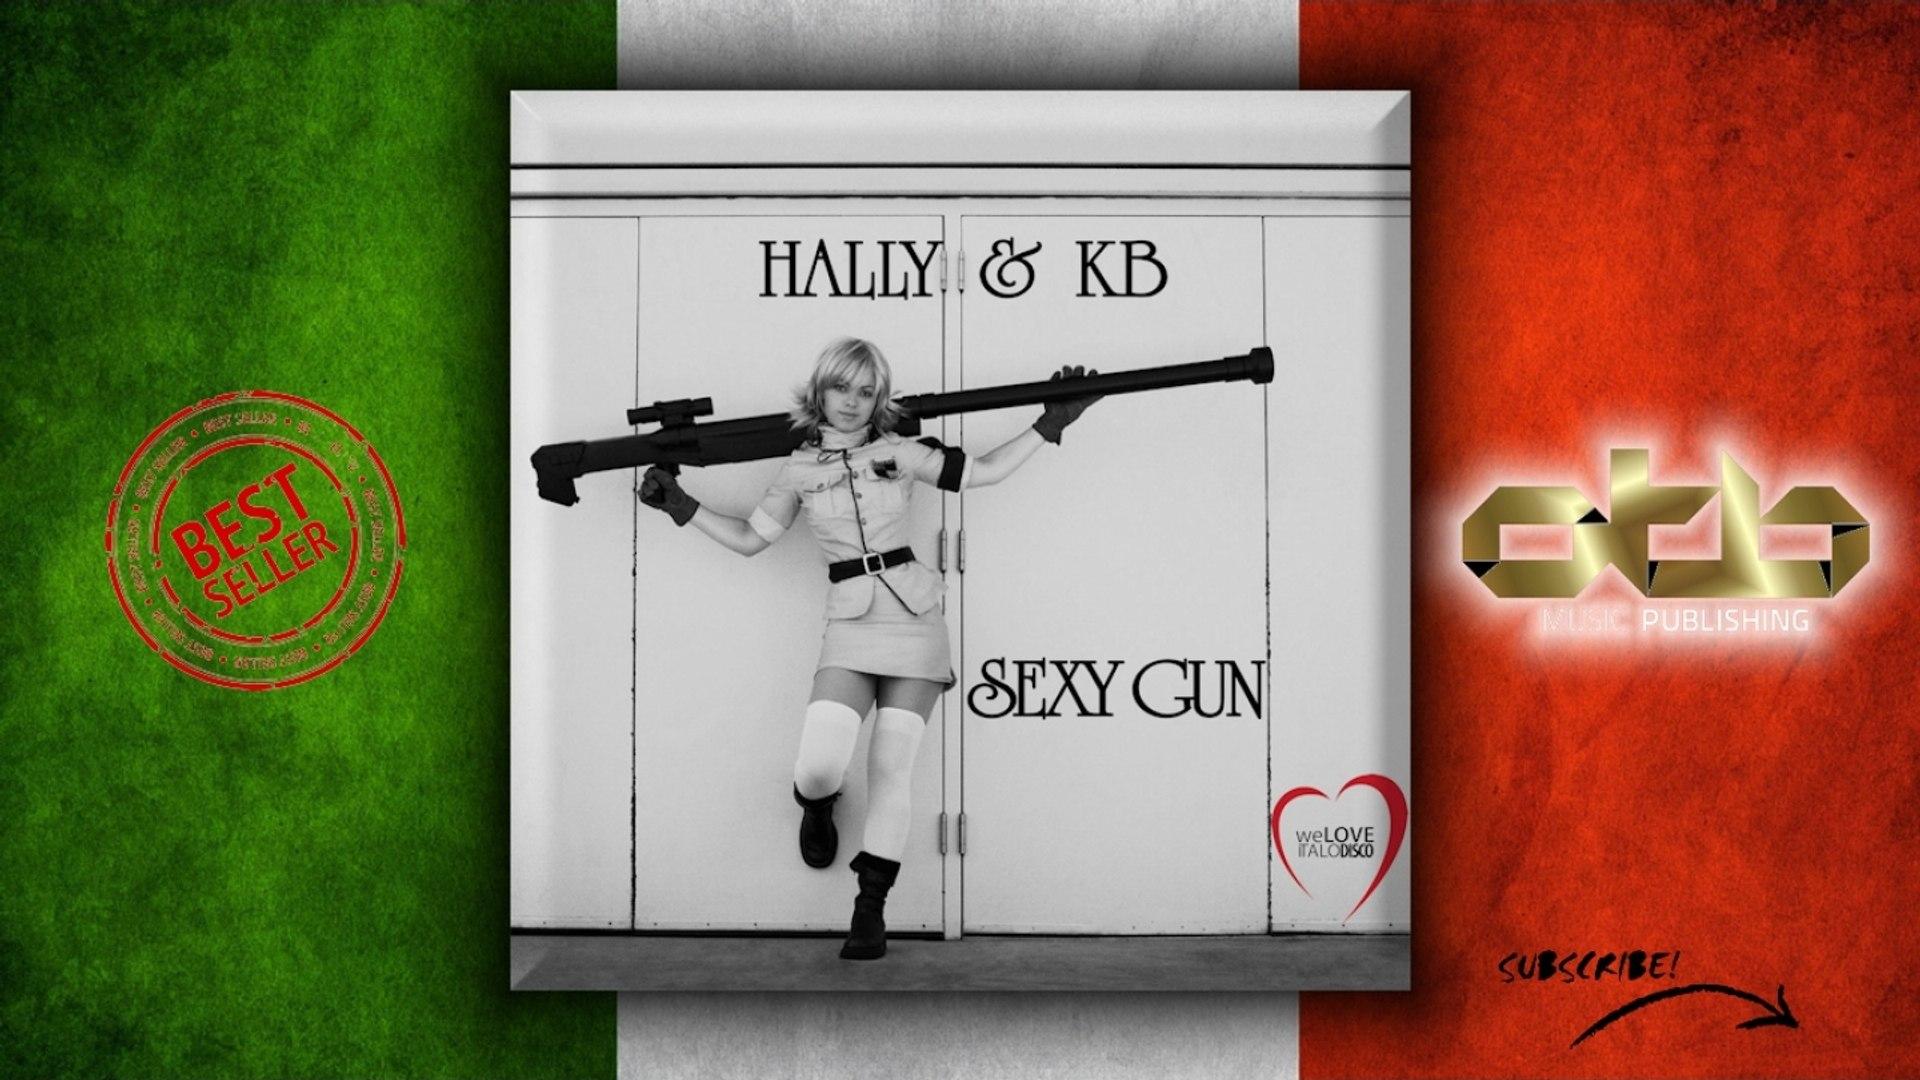 Hally, KB - Sexy Gun (Rap Mix) - [1986] [ITALO DISCO]